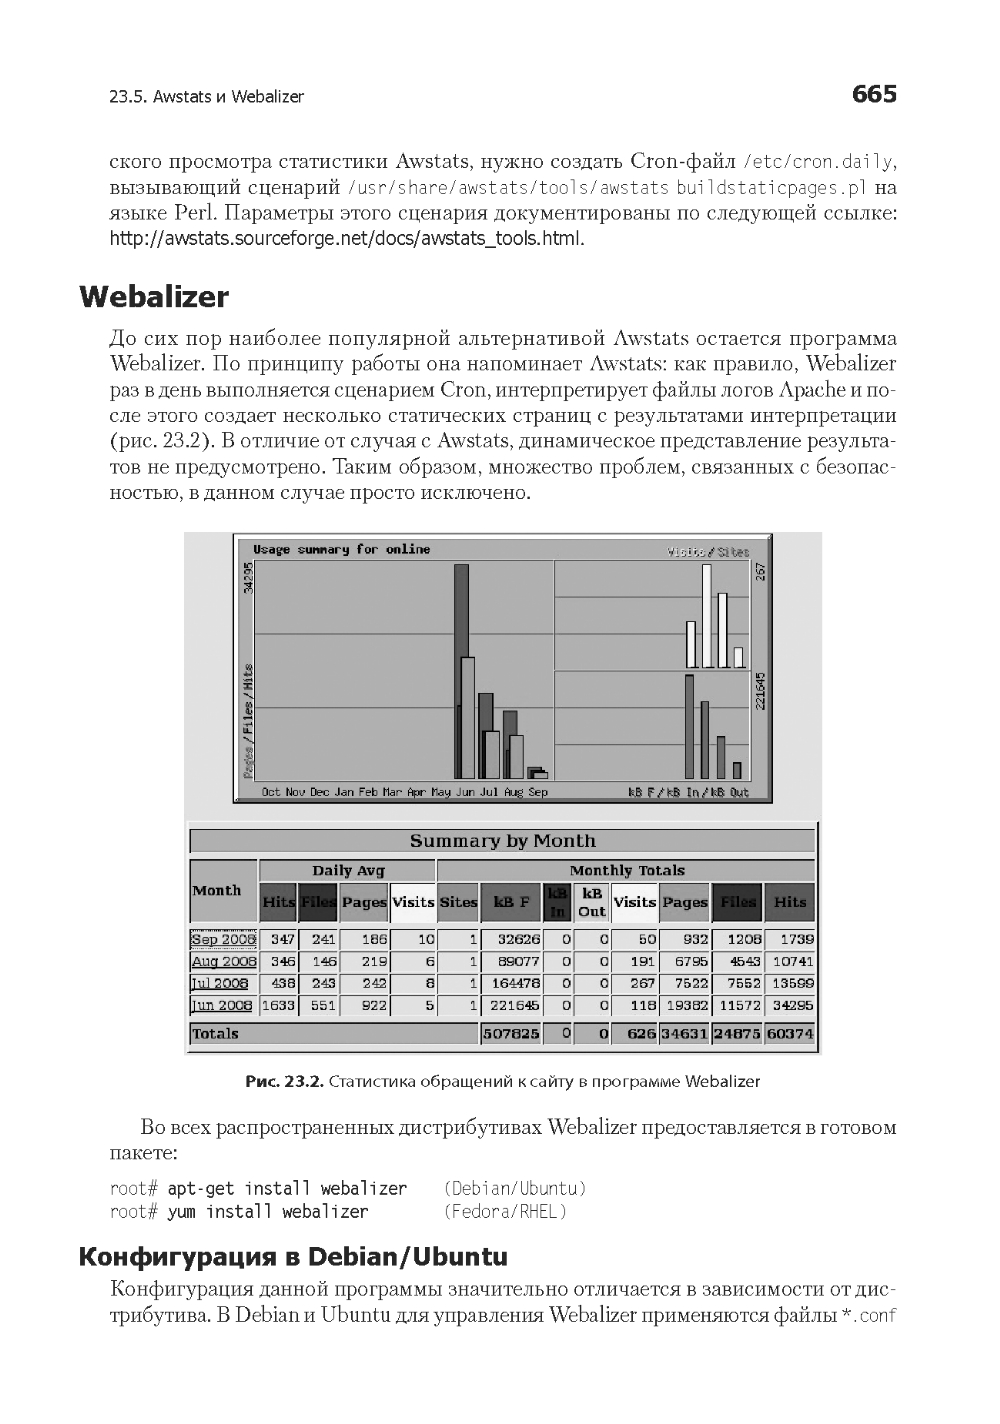 http://i5.imageban.ru/out/2013/12/11/2e0250c37a08174e56eba6b68fd77a6a.jpg